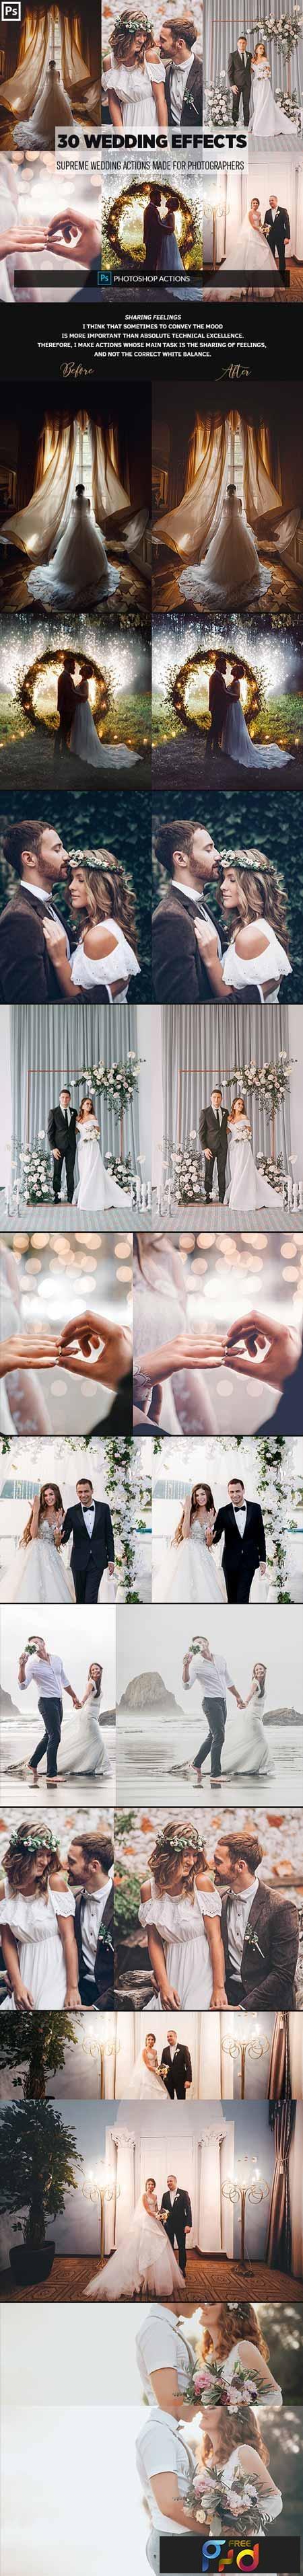 30 Wedding Photoshop Effects 23179940 1